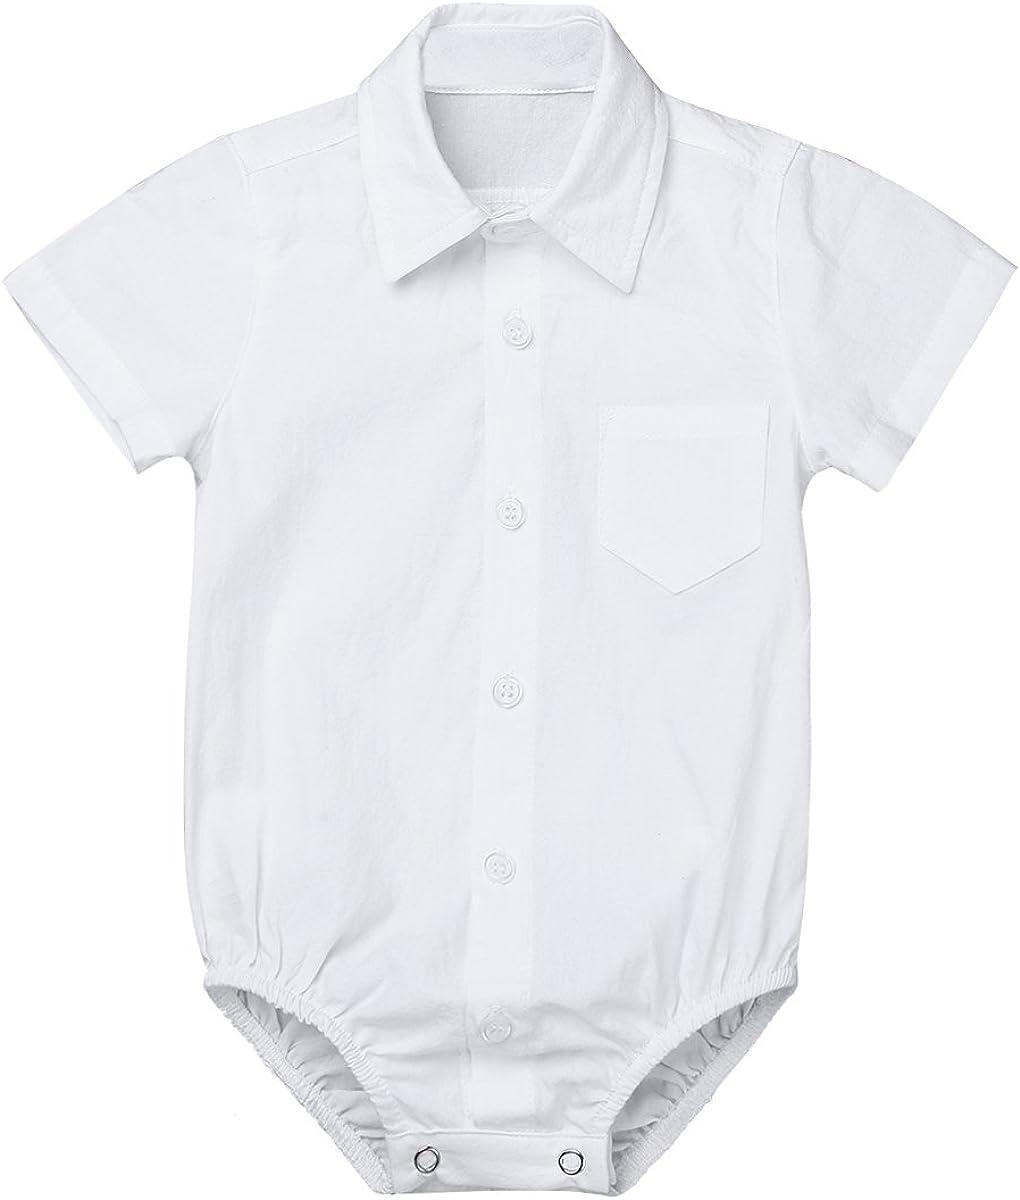 iiniim Body Algodón para Bebé Niño Niña (0-24 Meses) Mameluco Blanco Camsieta Manga Corta Ropa Infantil Traje de Fiesta Boda Bautizo Recién Nacido